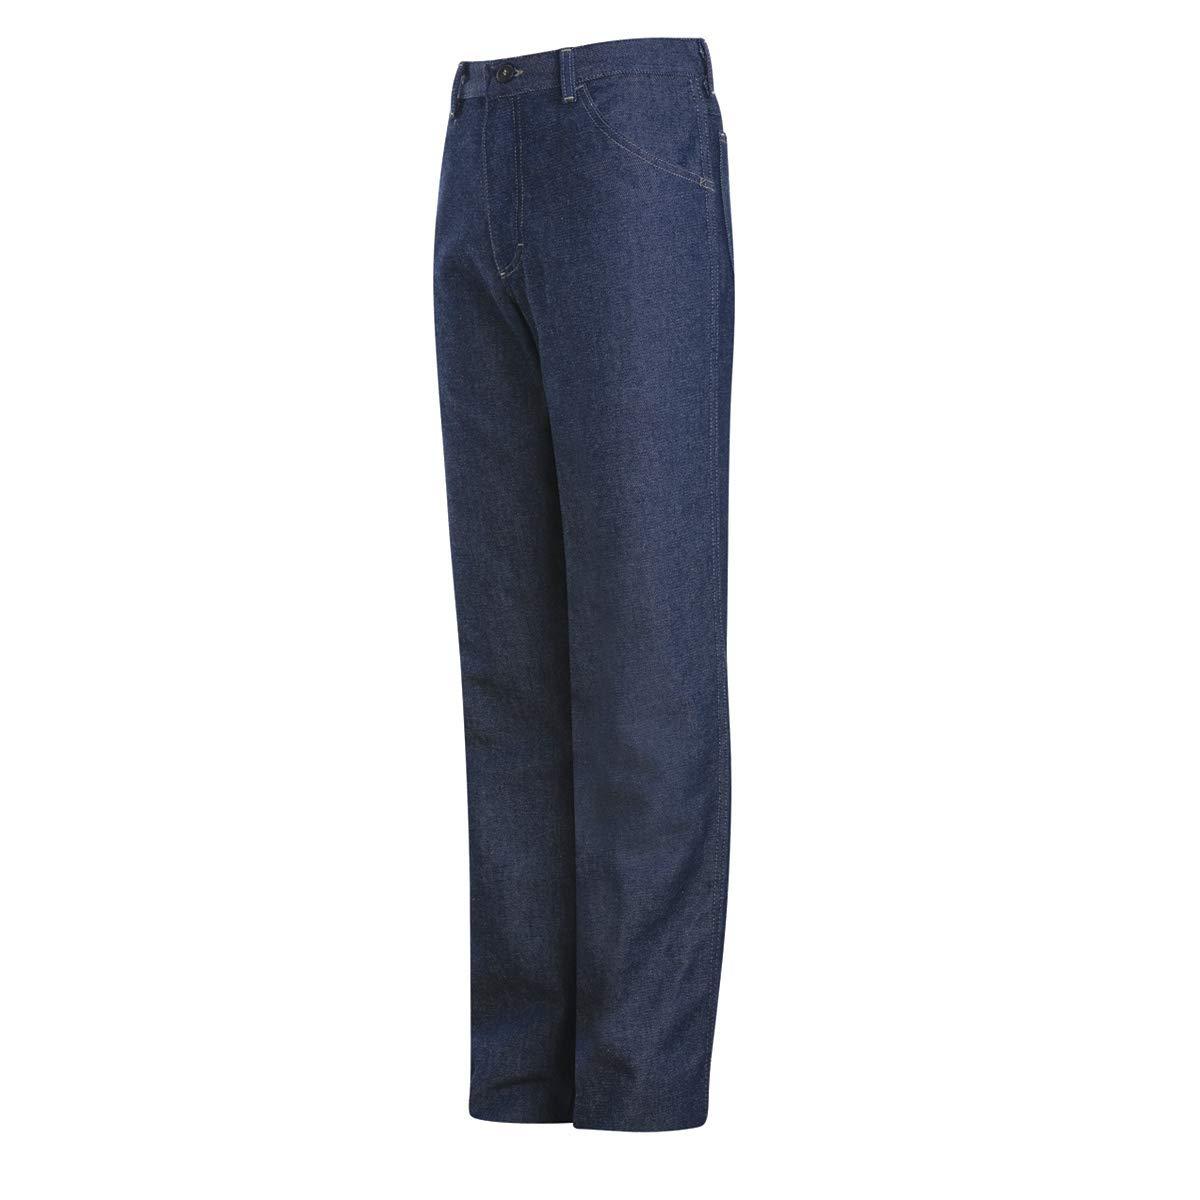 Bulwark 50 X 32 Dark Denim Cotton Denim Excel FR Flame Resistant Denim Jeans With Button Closure